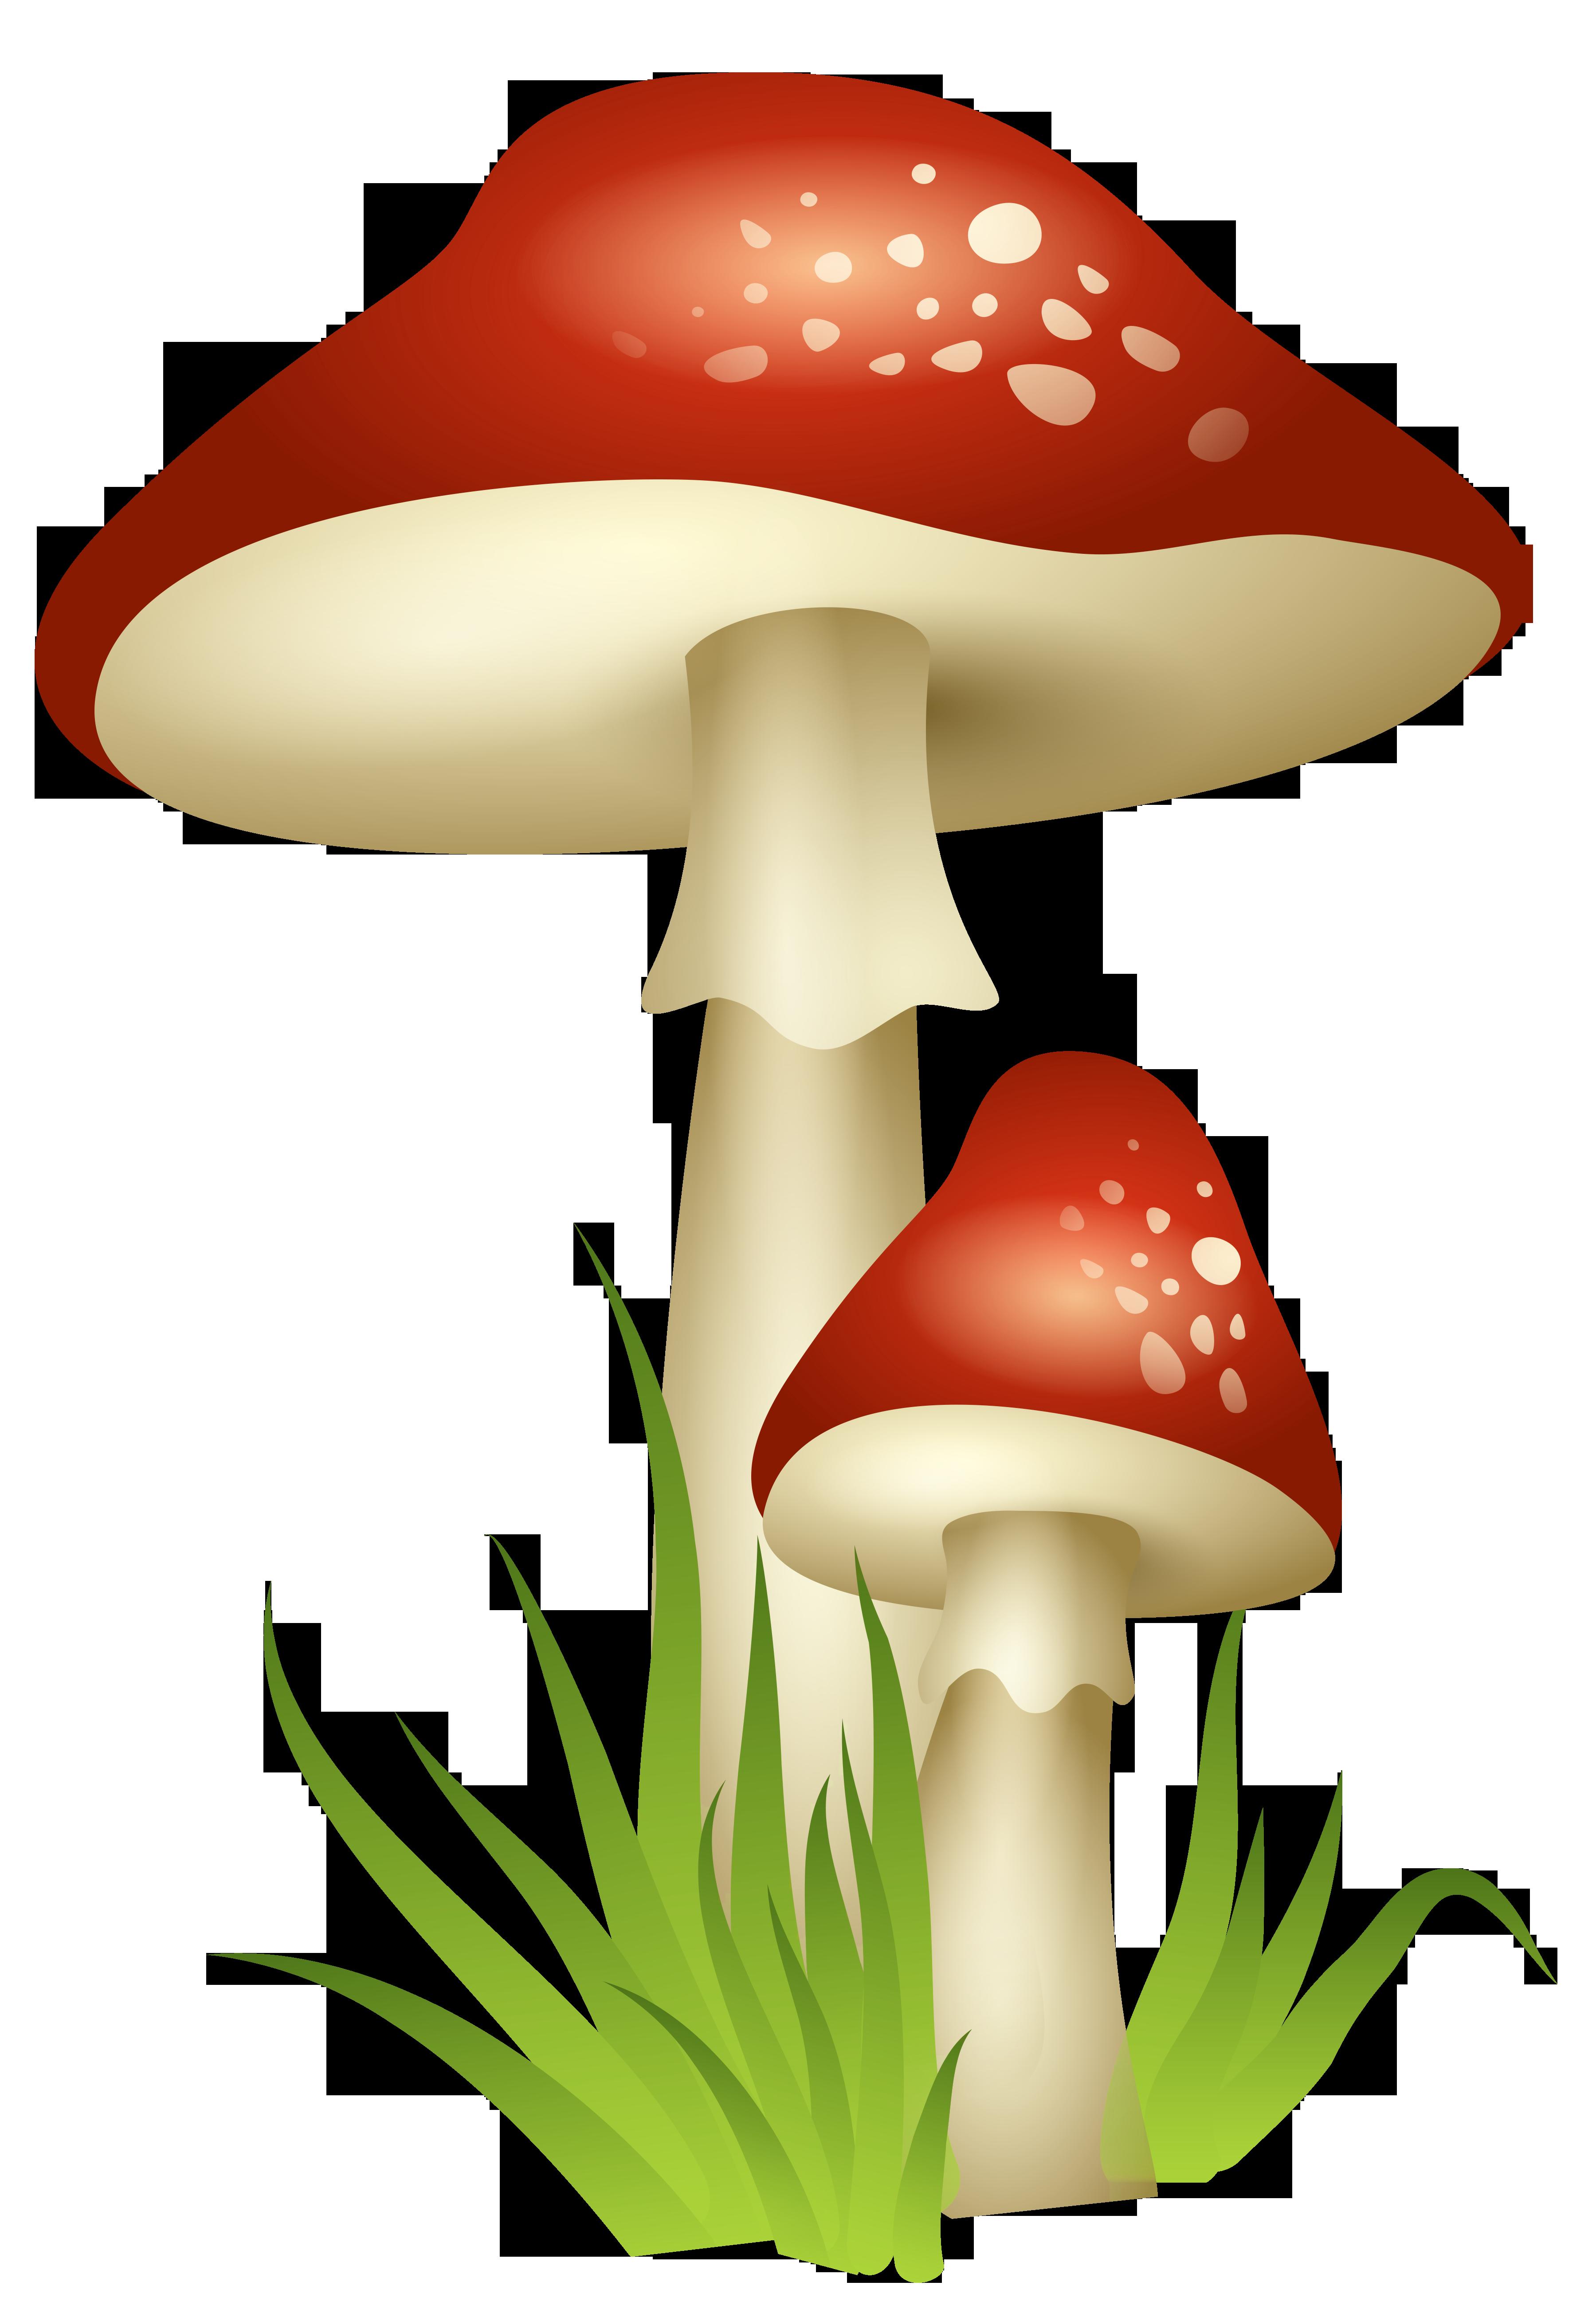 Mushroom clipart transparent background #9 - Toadstool PNG HD